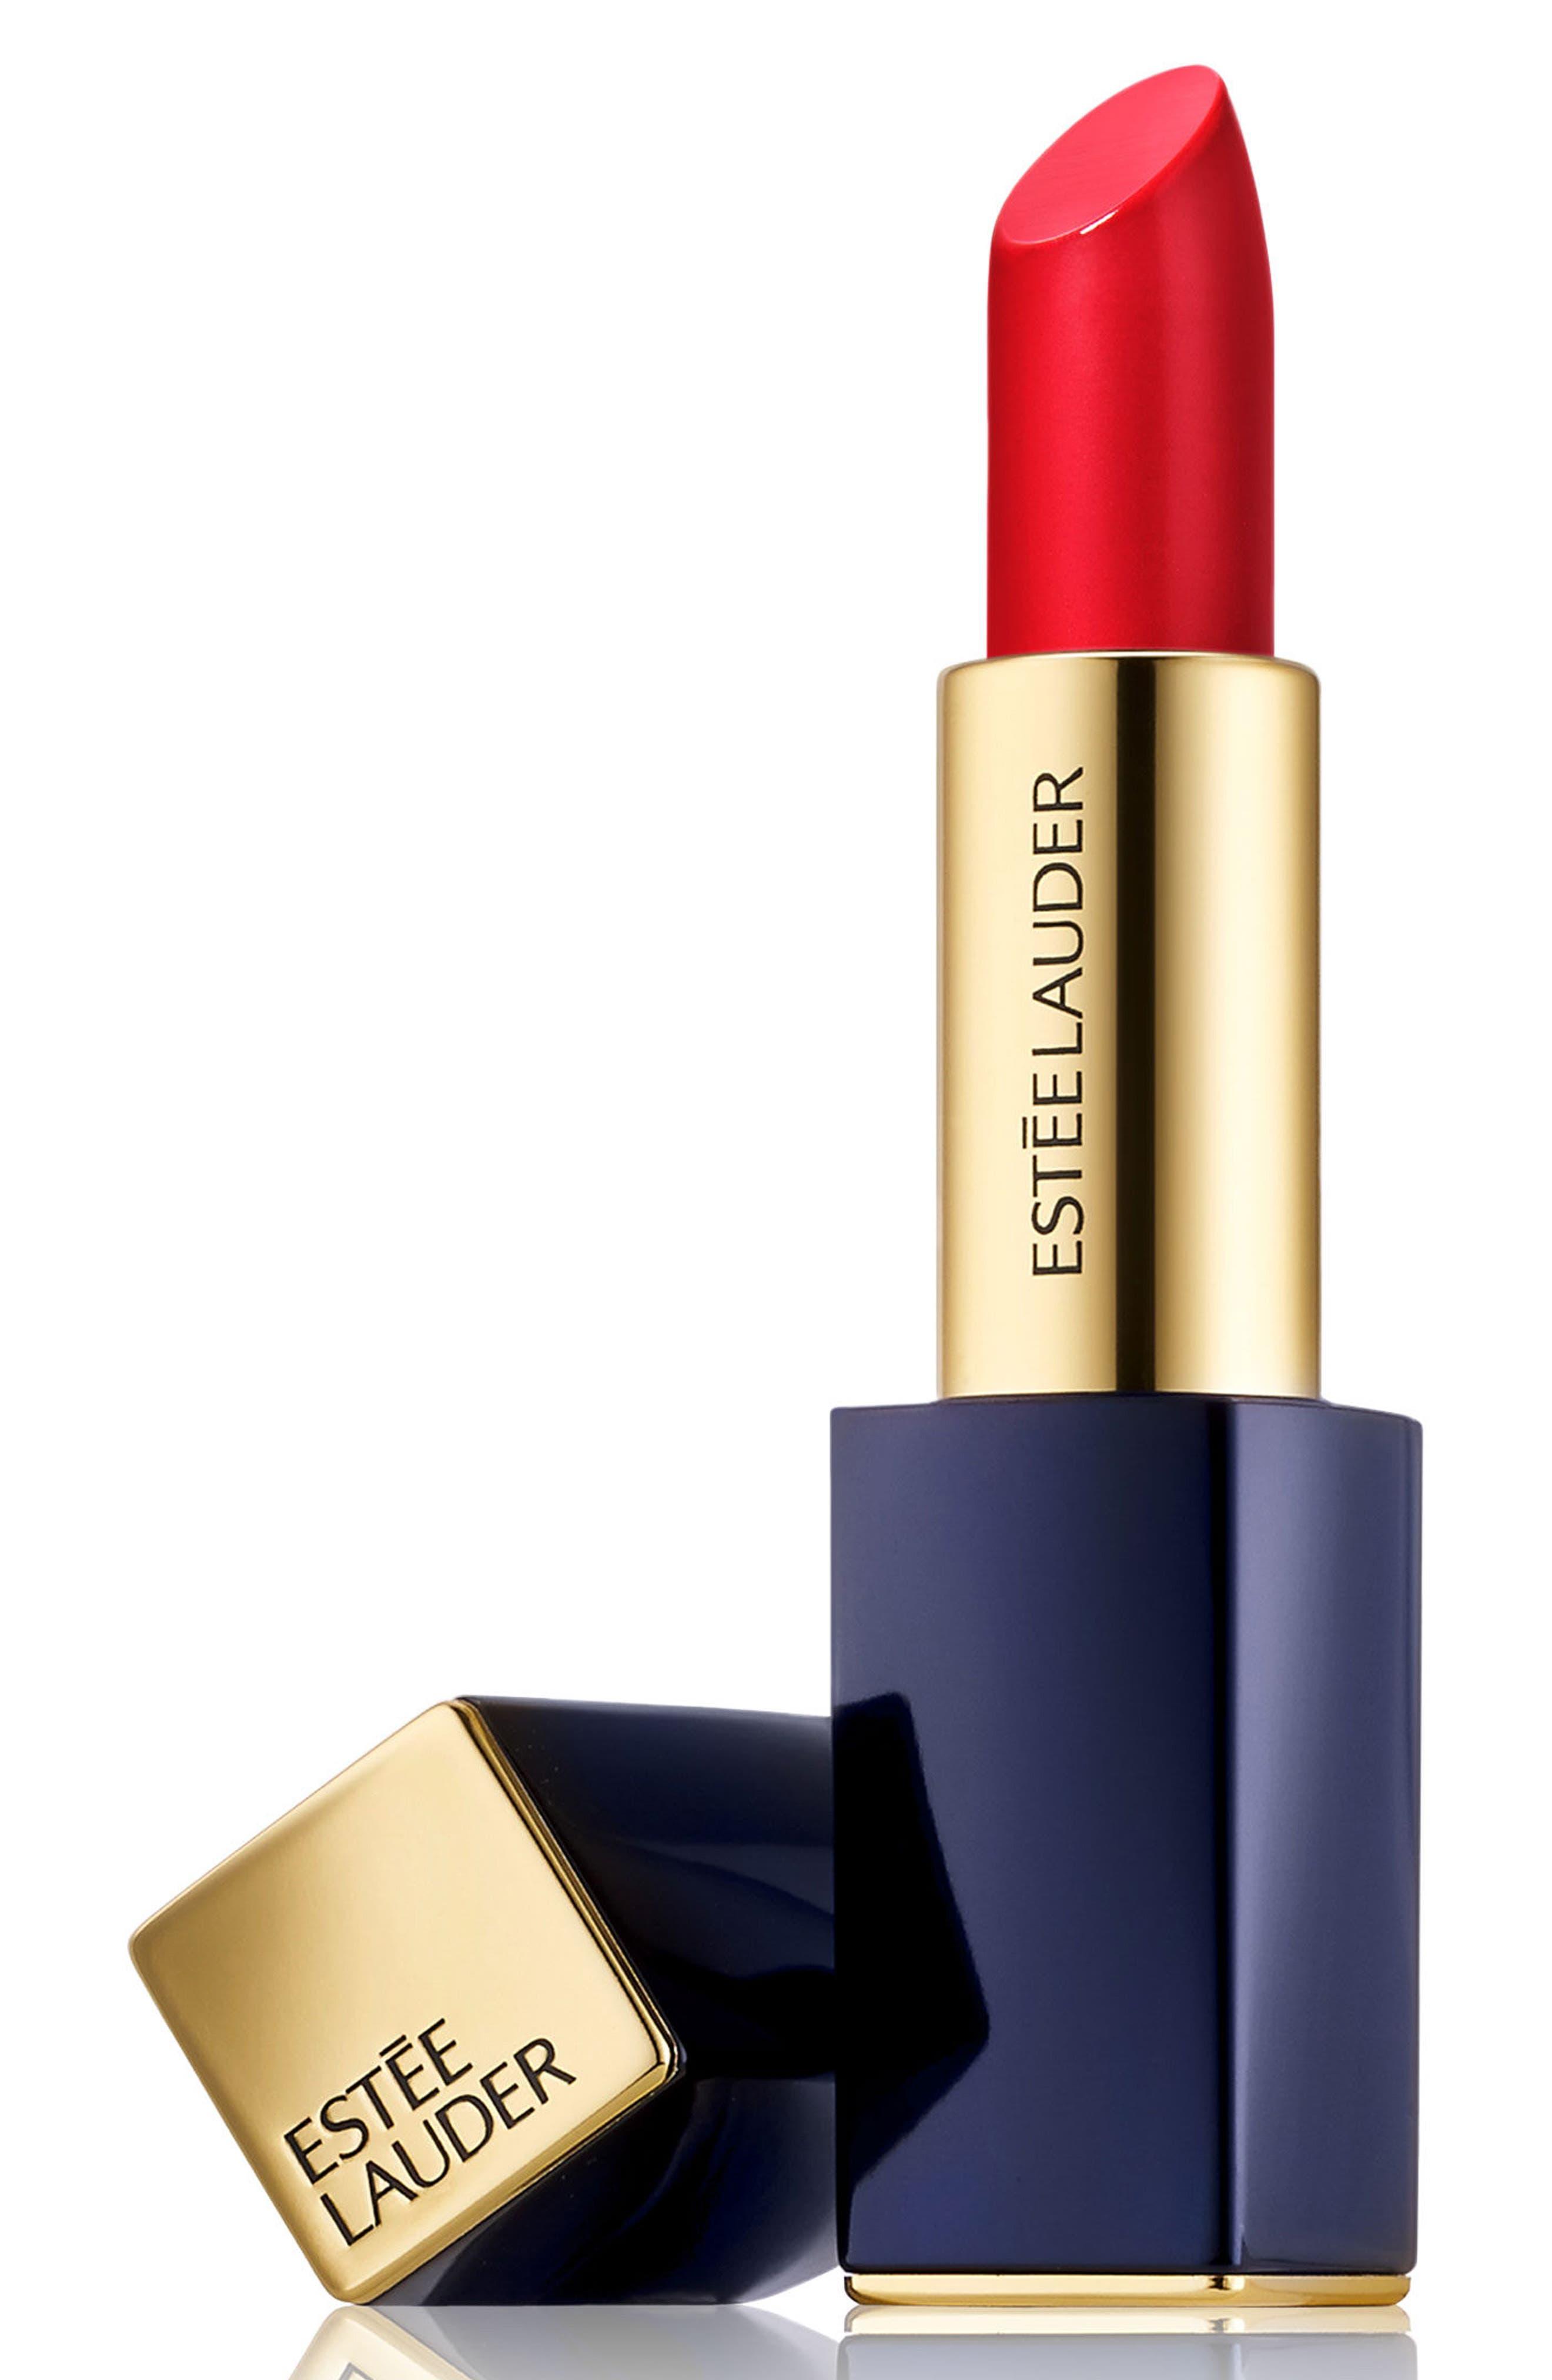 Alternate Image 1 Selected - Estée Lauder Pure Color Envy Sheer Matte Sculpting Lipstick